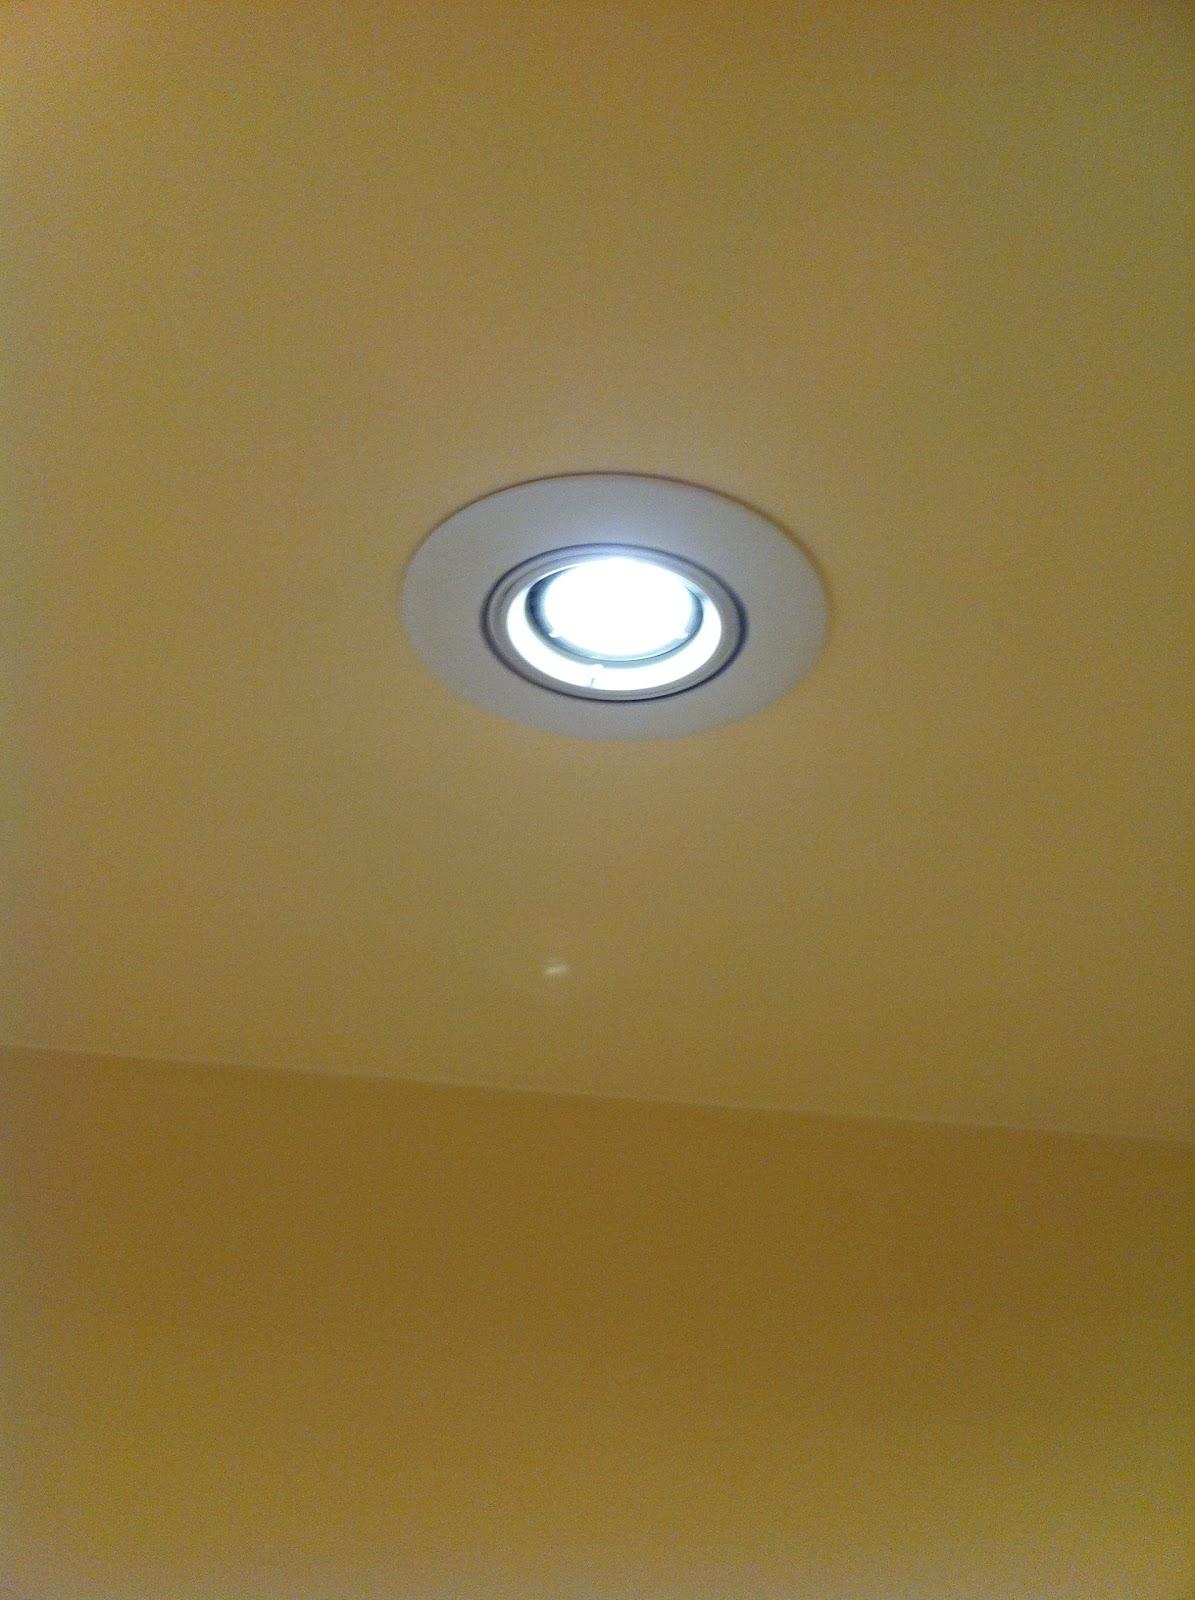 GEN3 Electric 215 352 5963 Recessed Lights 4inch GU10